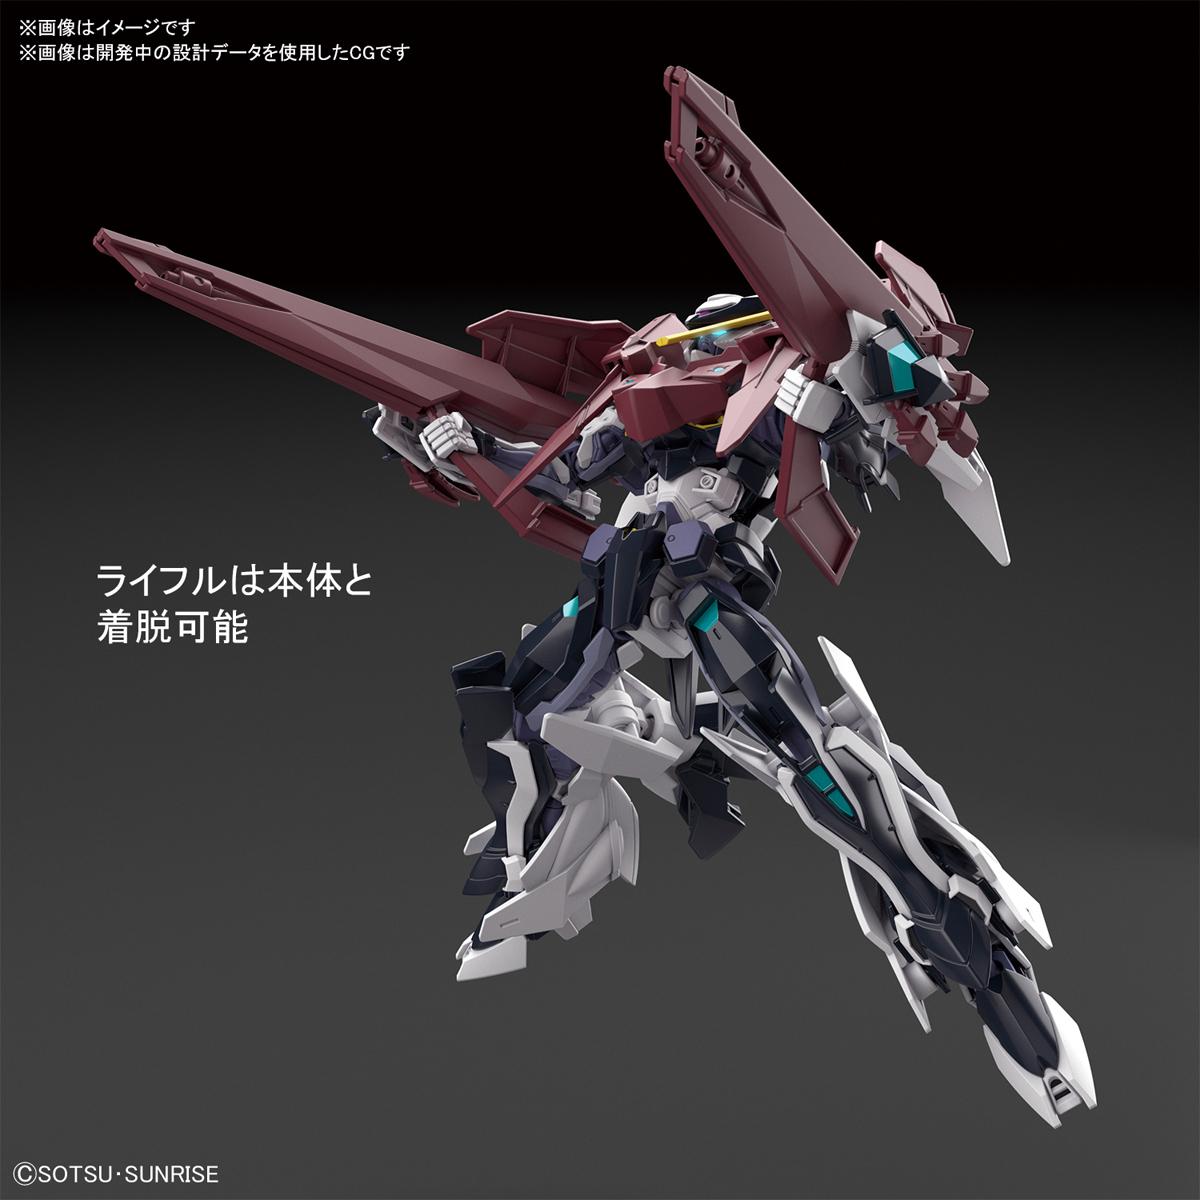 HGBD:R 1/144『ガンダムアストレイ系新機体』ガンダムビルドダイバーズRe:RISE プラモデル-003